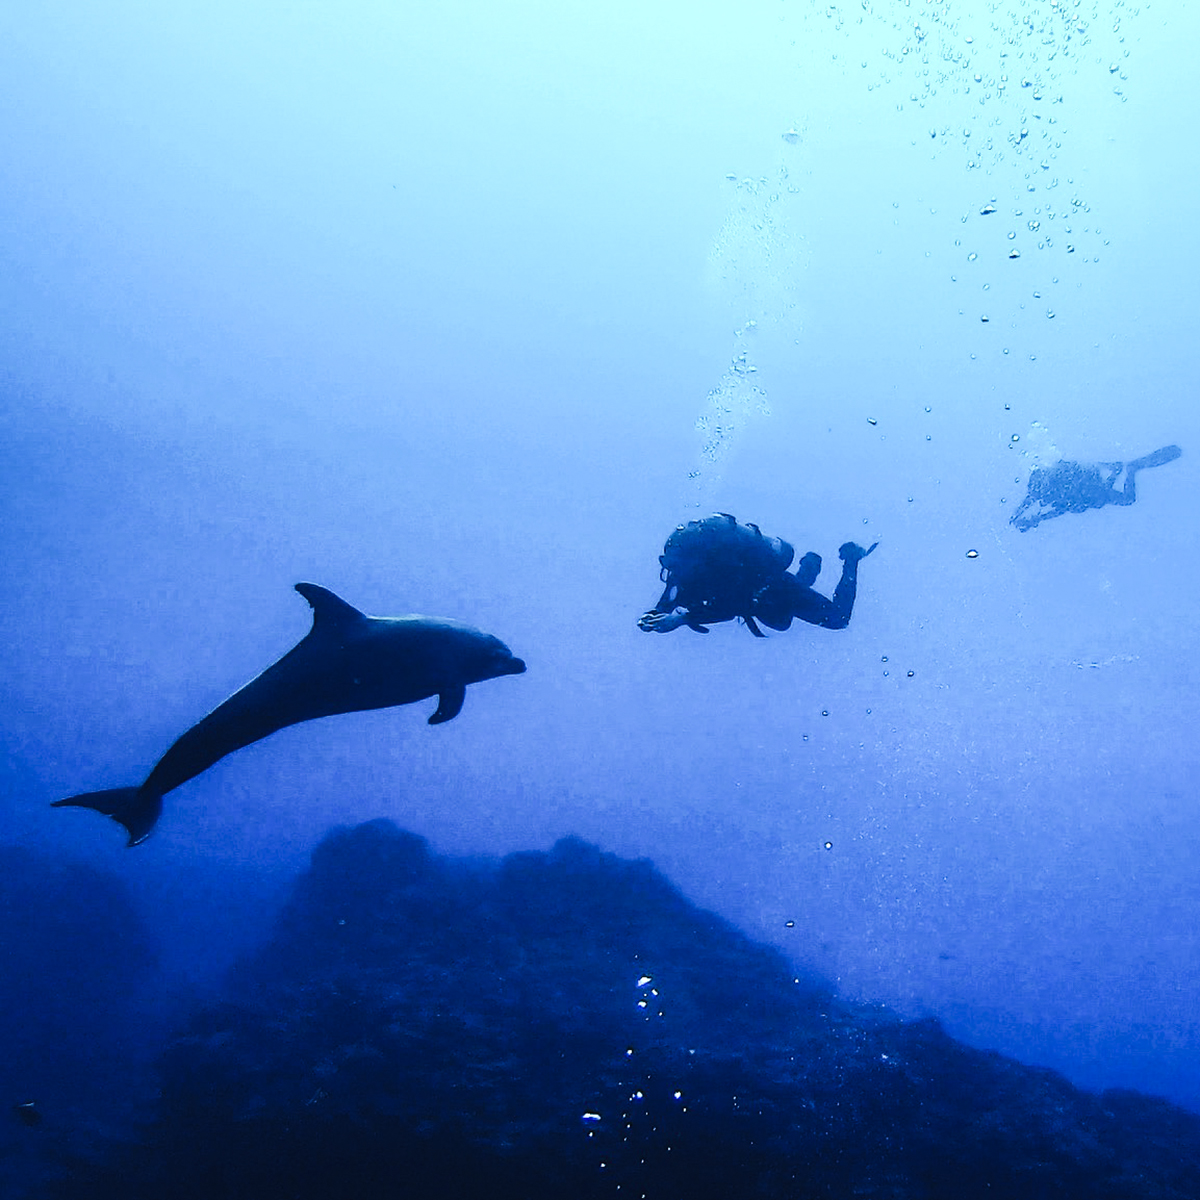 A curious dolphin checks out a diver